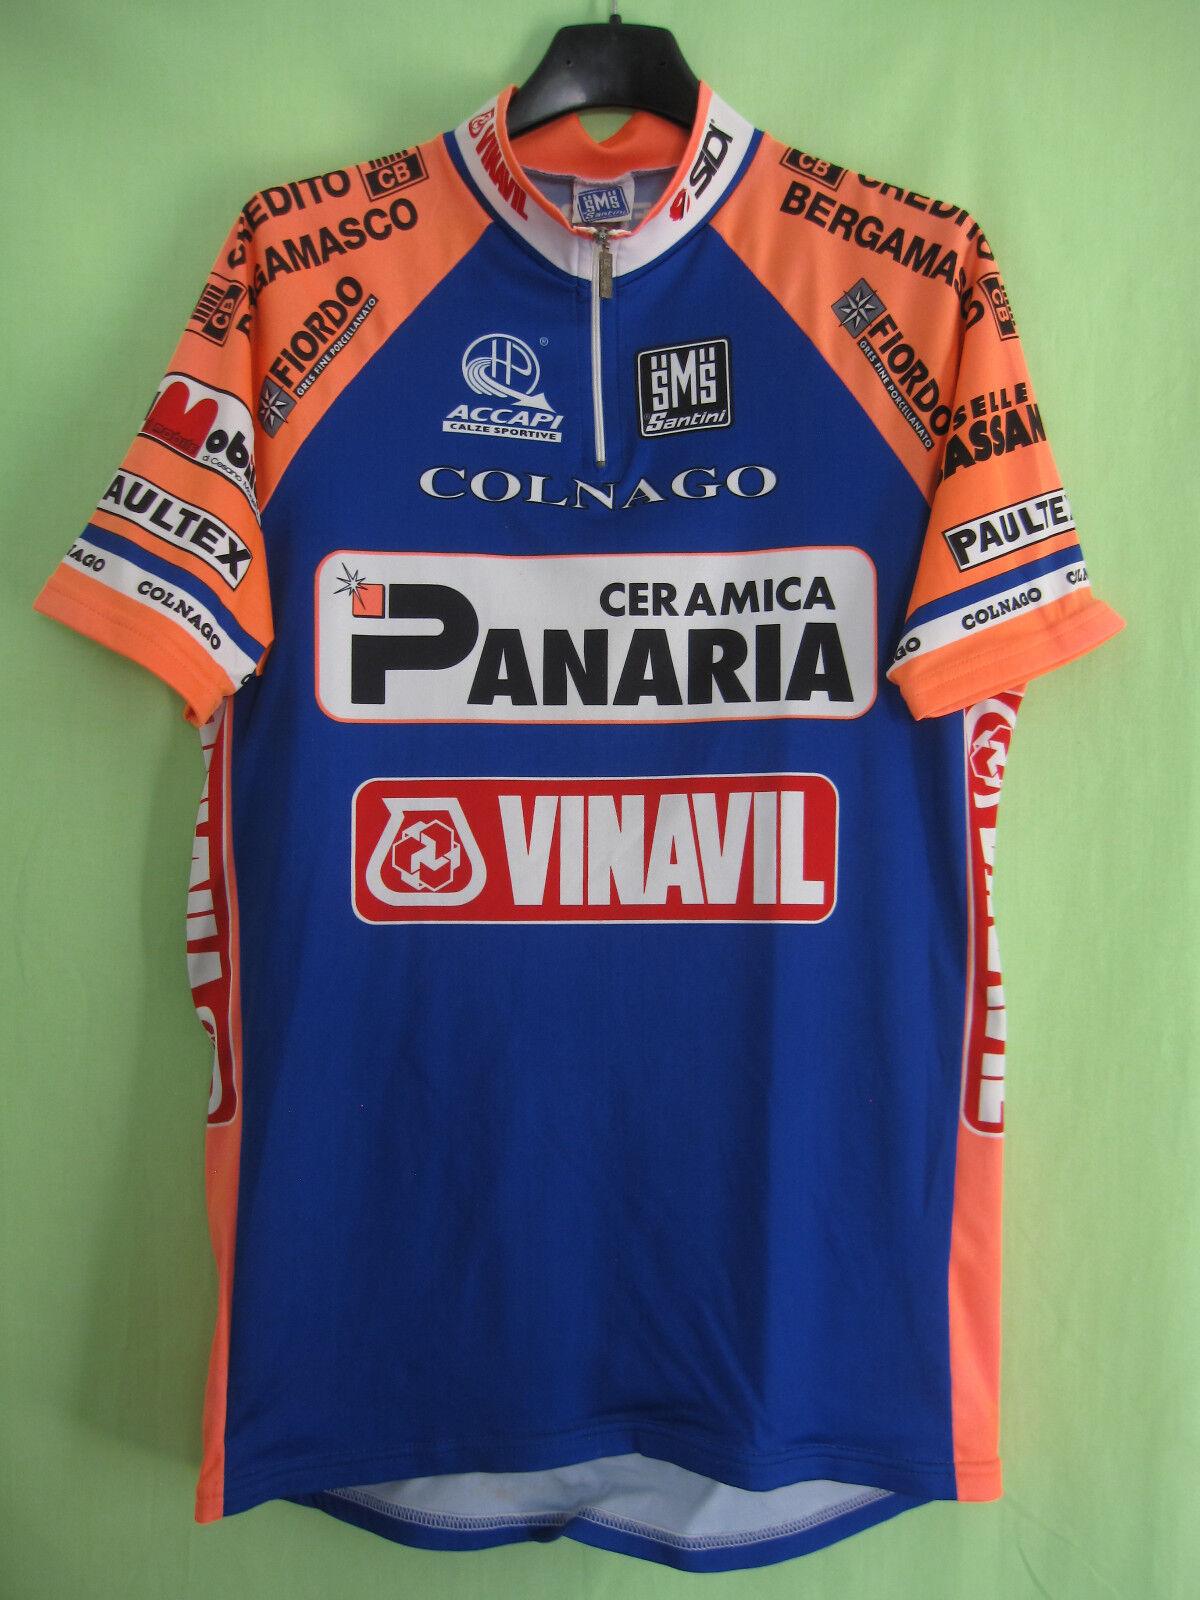 Maillot cycliste Panaria Vinavil Team 1996 Santini Colnago Jersey Vintage - XL